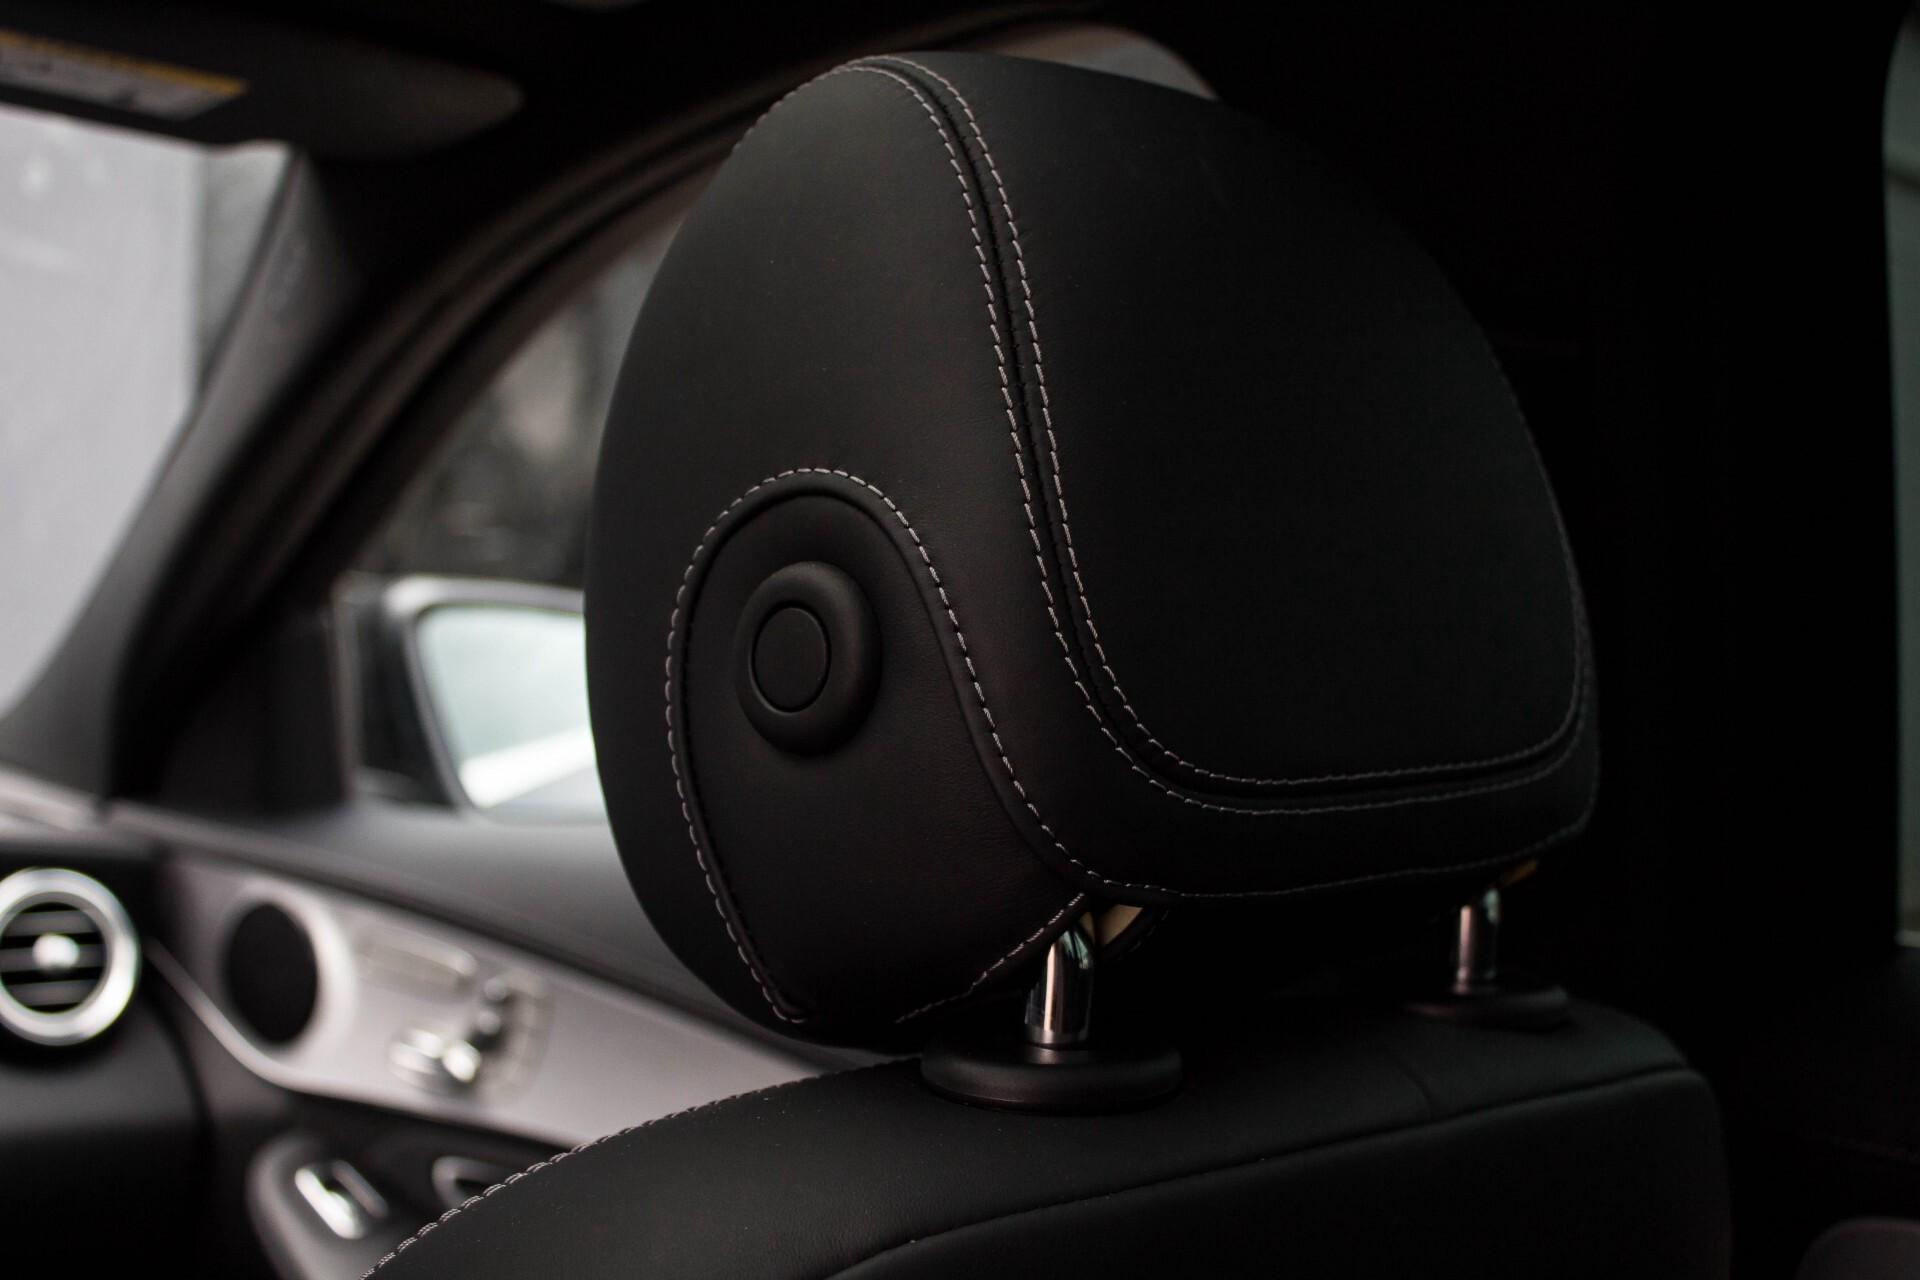 Mercedes-Benz C-Klasse 63 AMG S Panorama/Distronic/Keyless/Comand/Camera/ILS Aut7 Foto 59